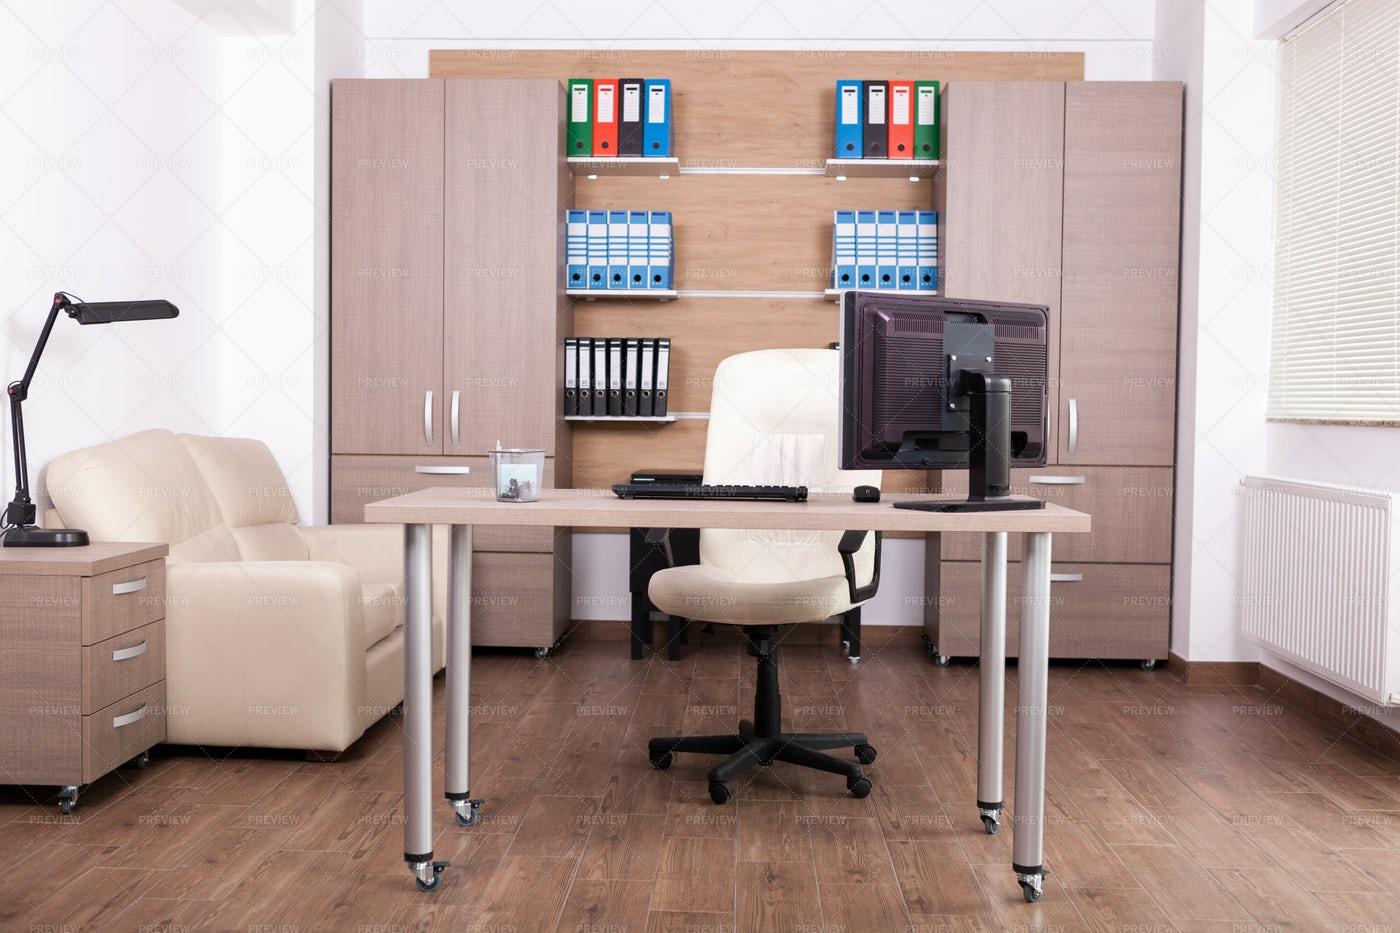 Business Office Interior: Stock Photos